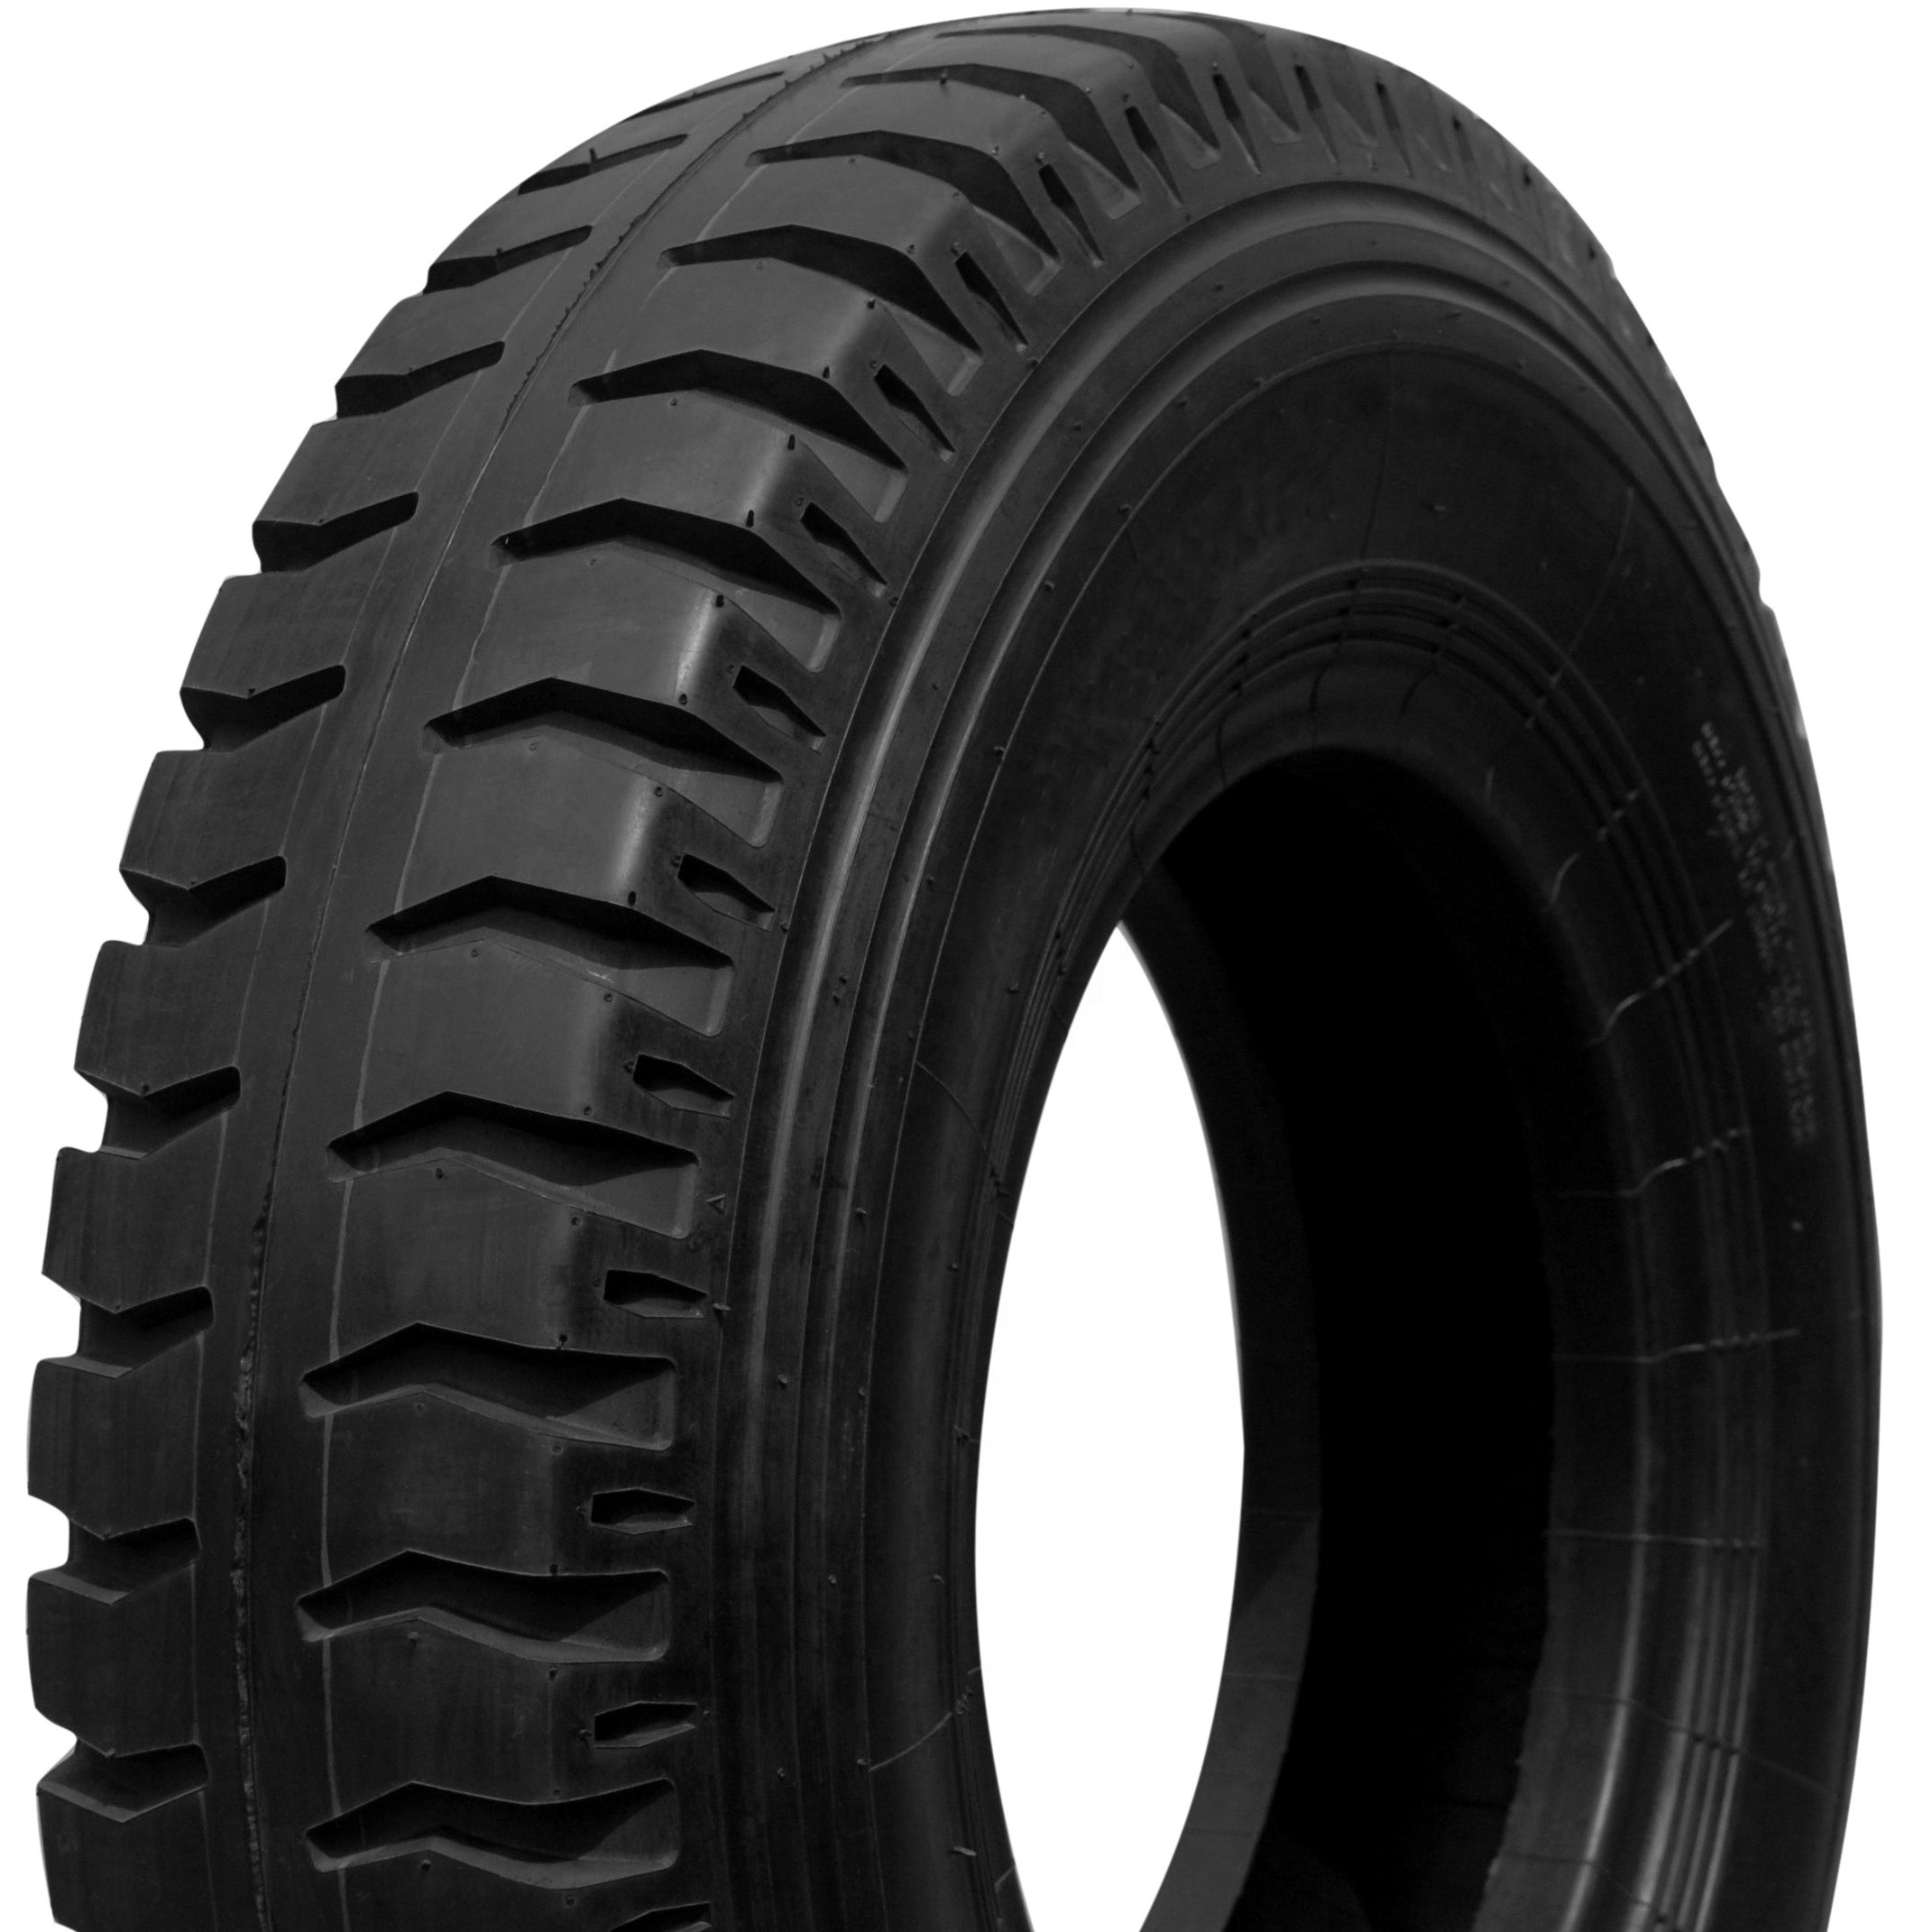 Hot sale 12.00-20 24  LUG and RIB light truck tyres